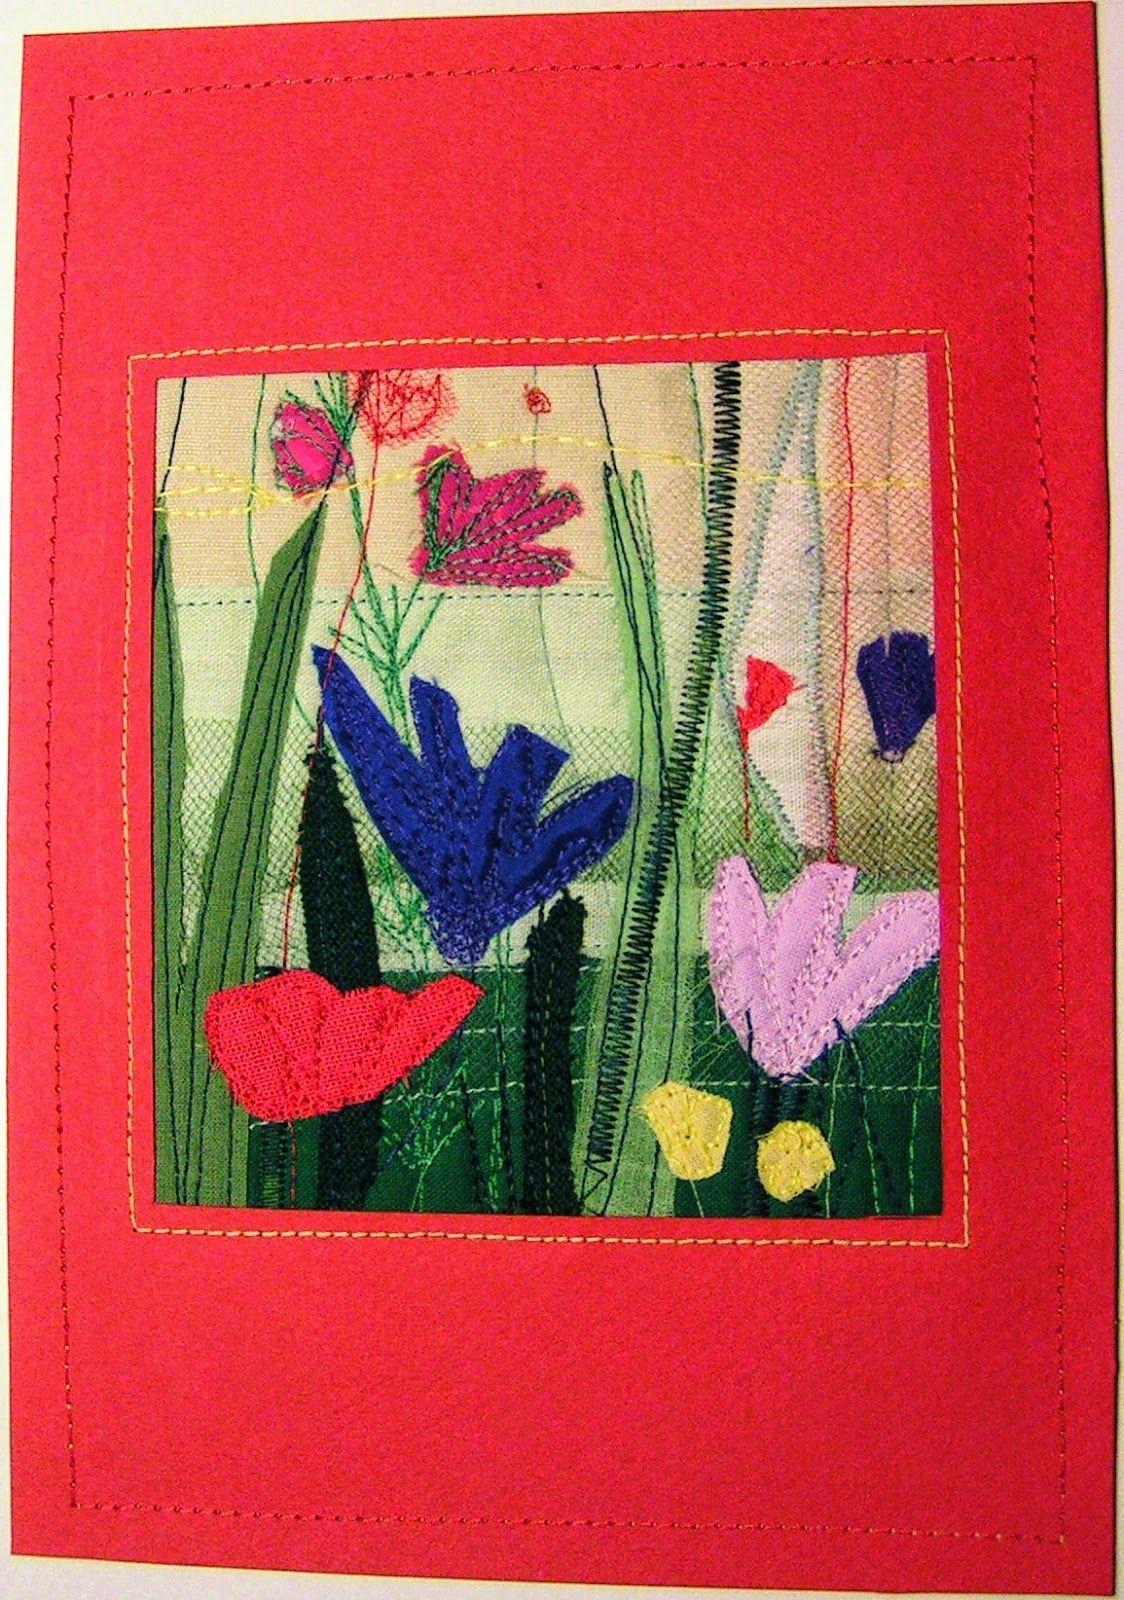 mini quilt by Anna Sławińska